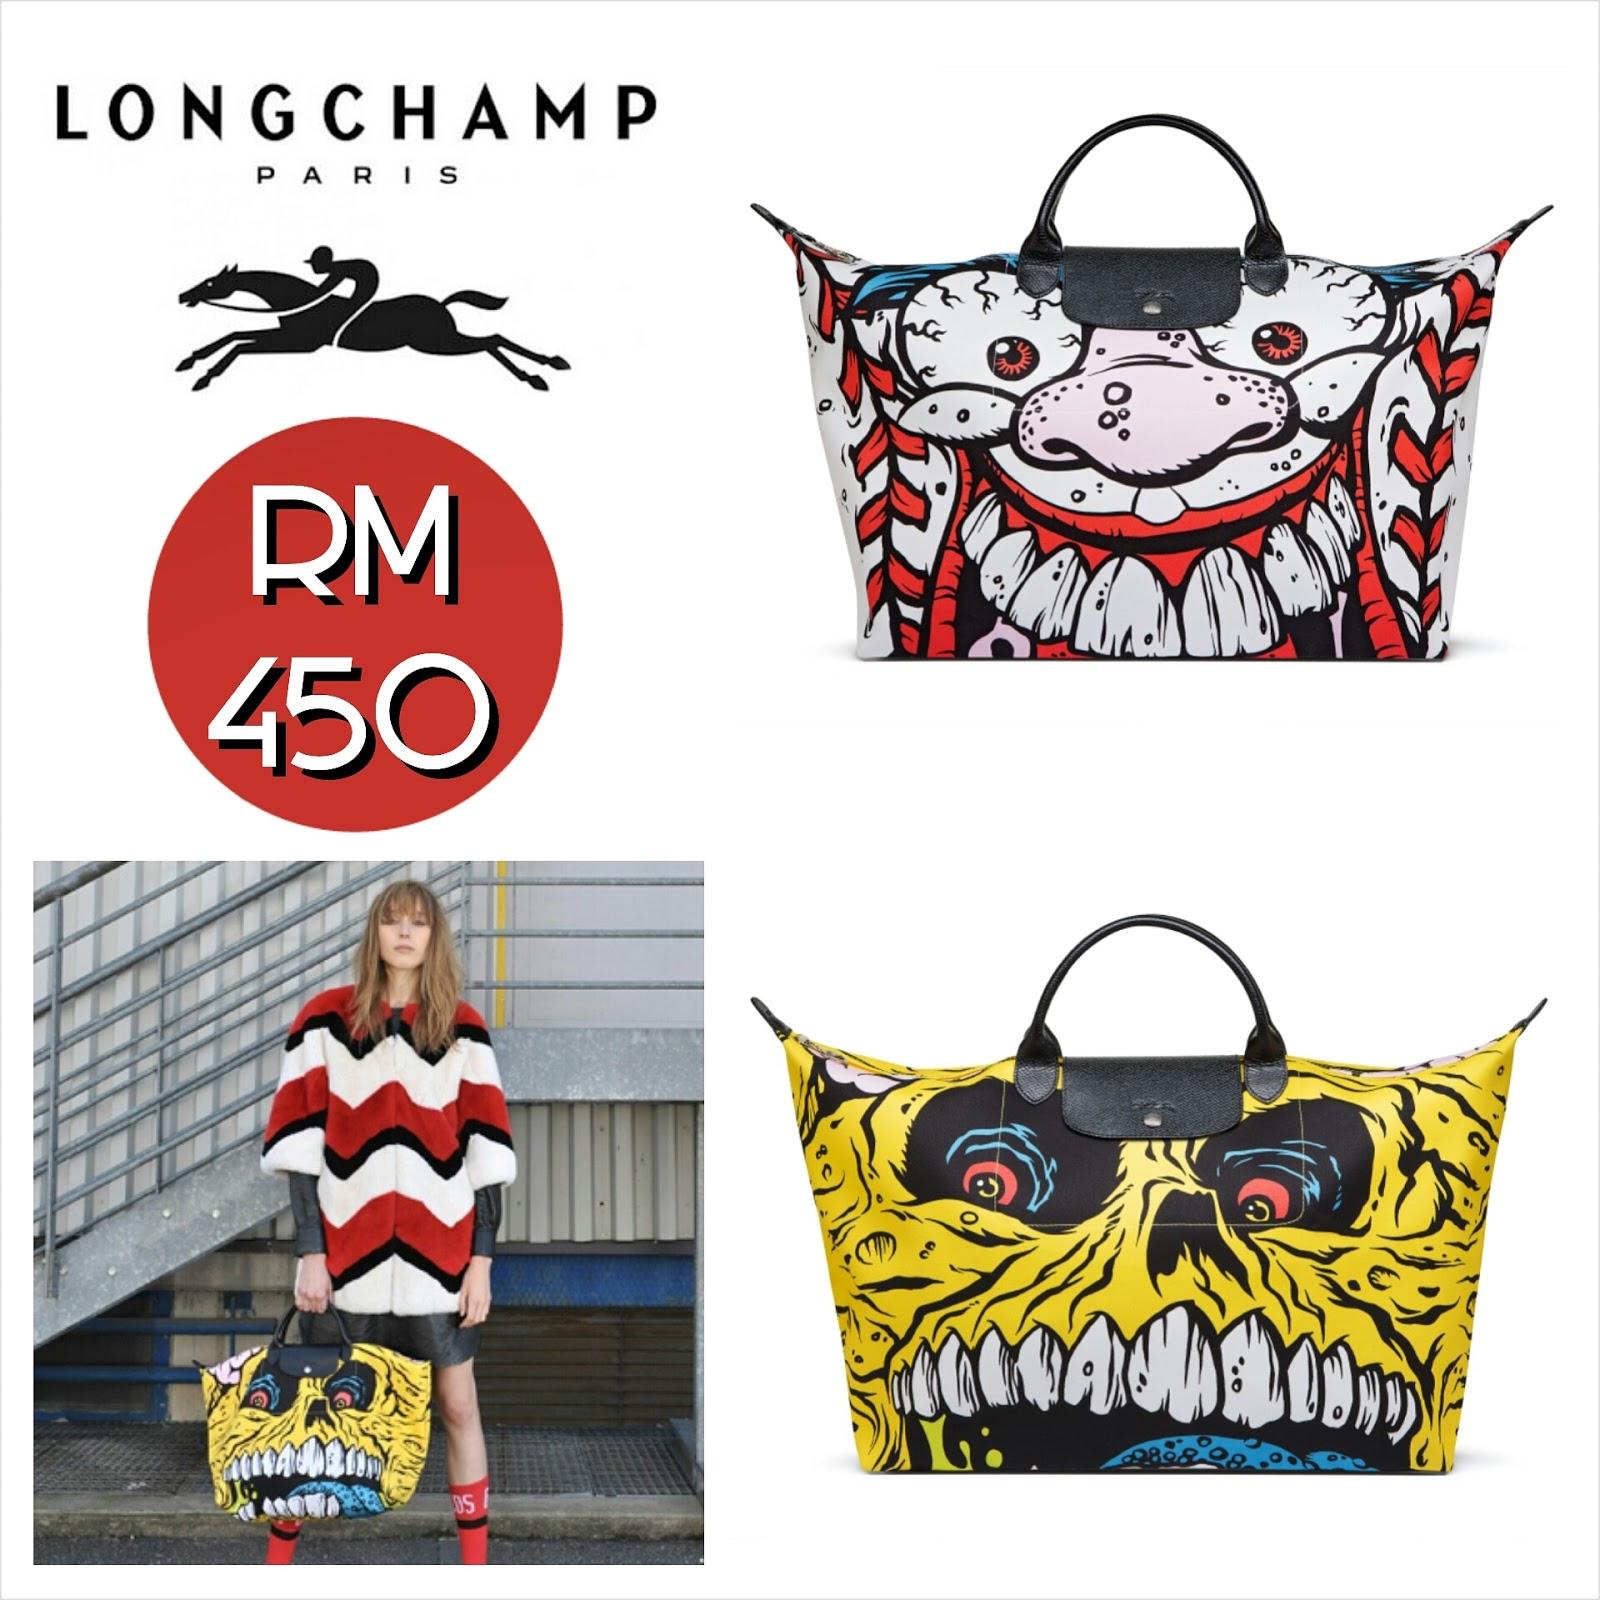 Longchamp Jeremy Scott Buy Online